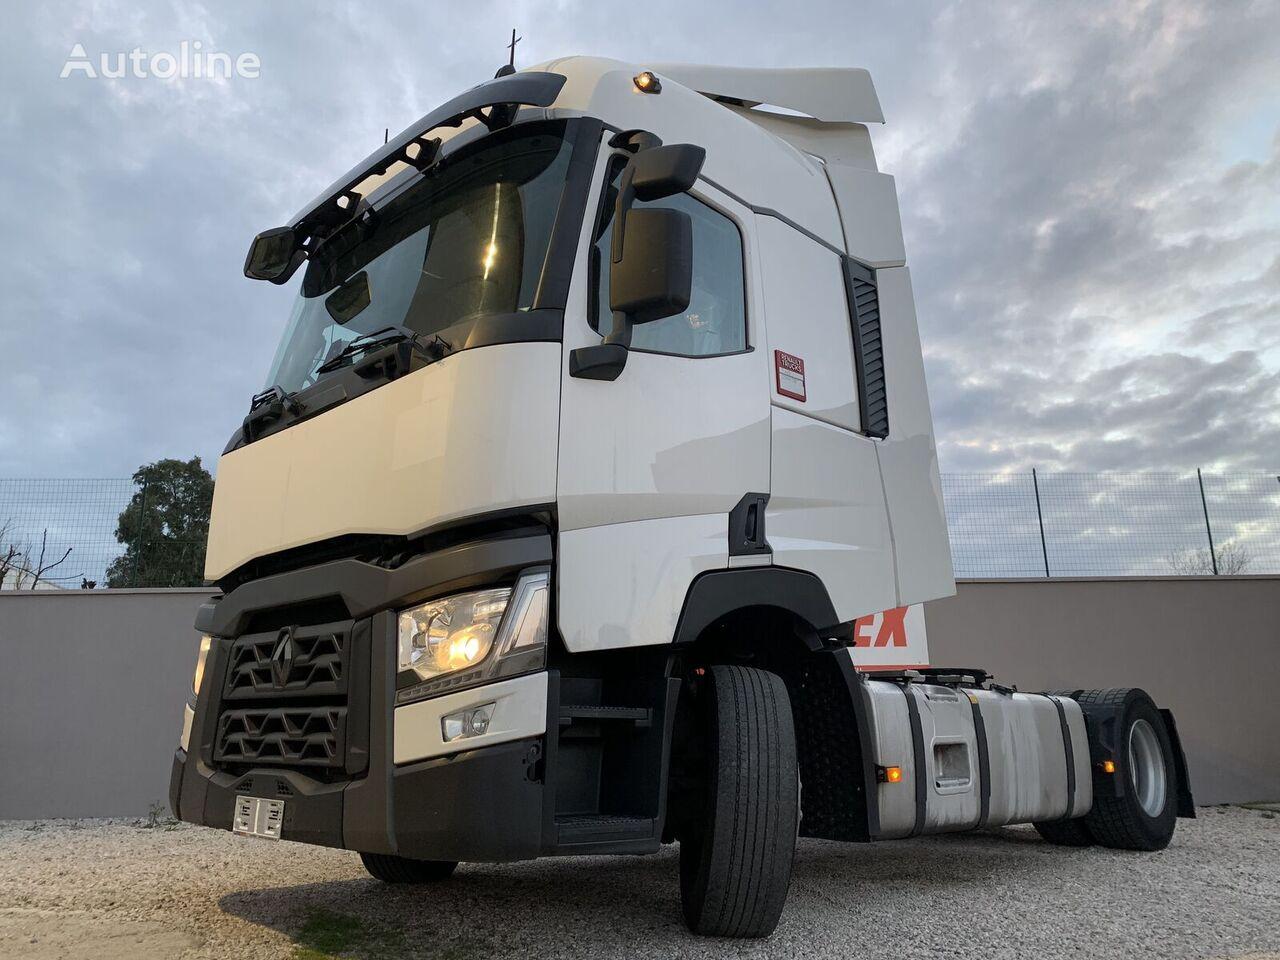 RENAULT 2017 -T 440 Comfort - Km 480.000 motore Volvo 12777 cc, 450 CV tractor unit